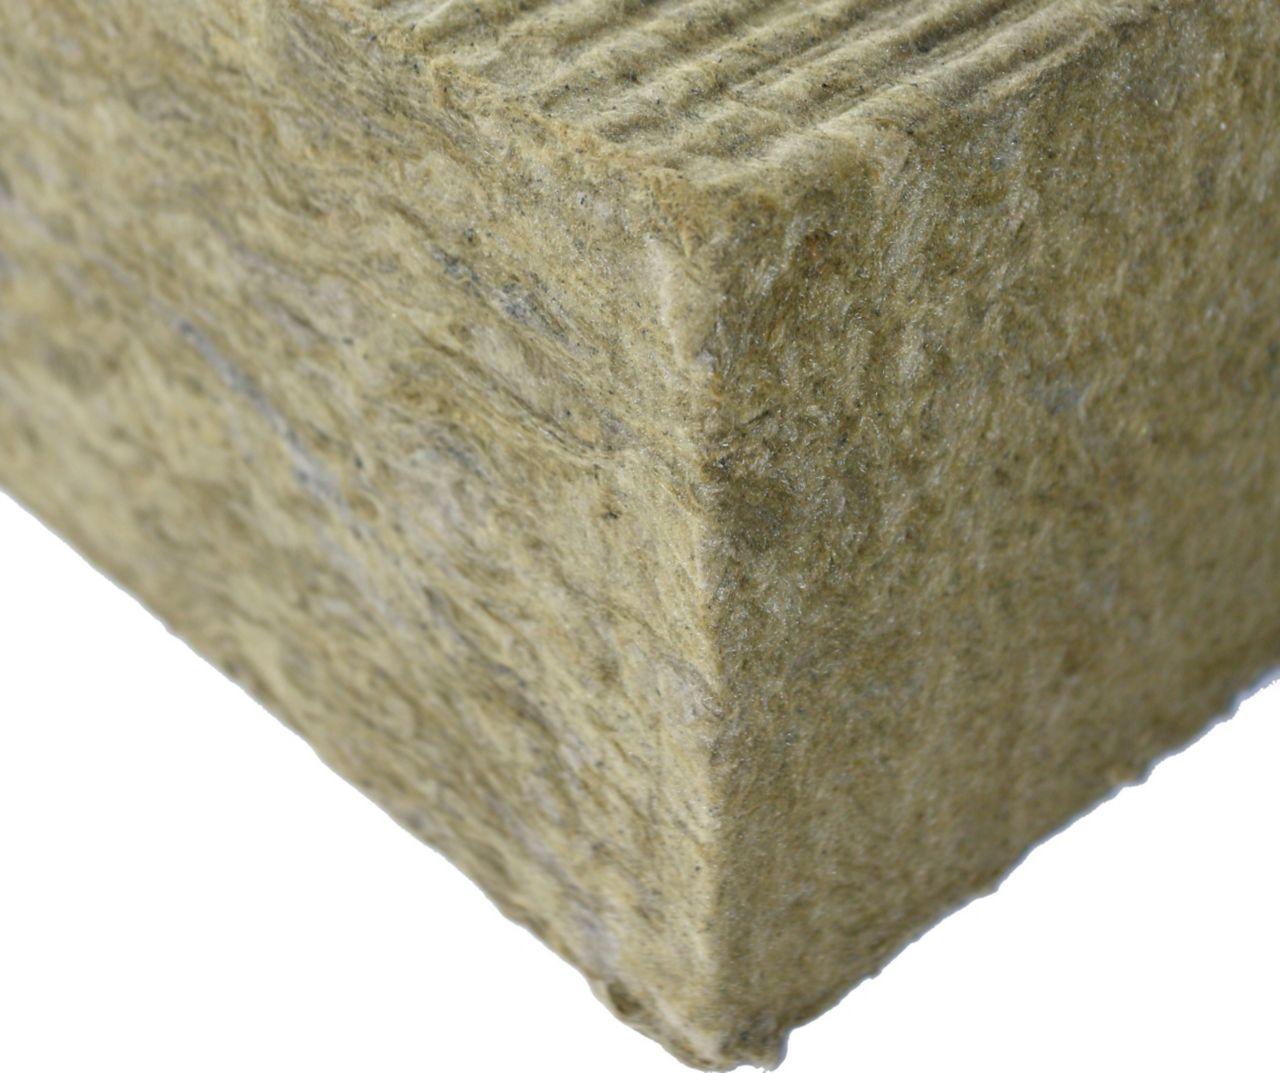 Mineral wool insulation board